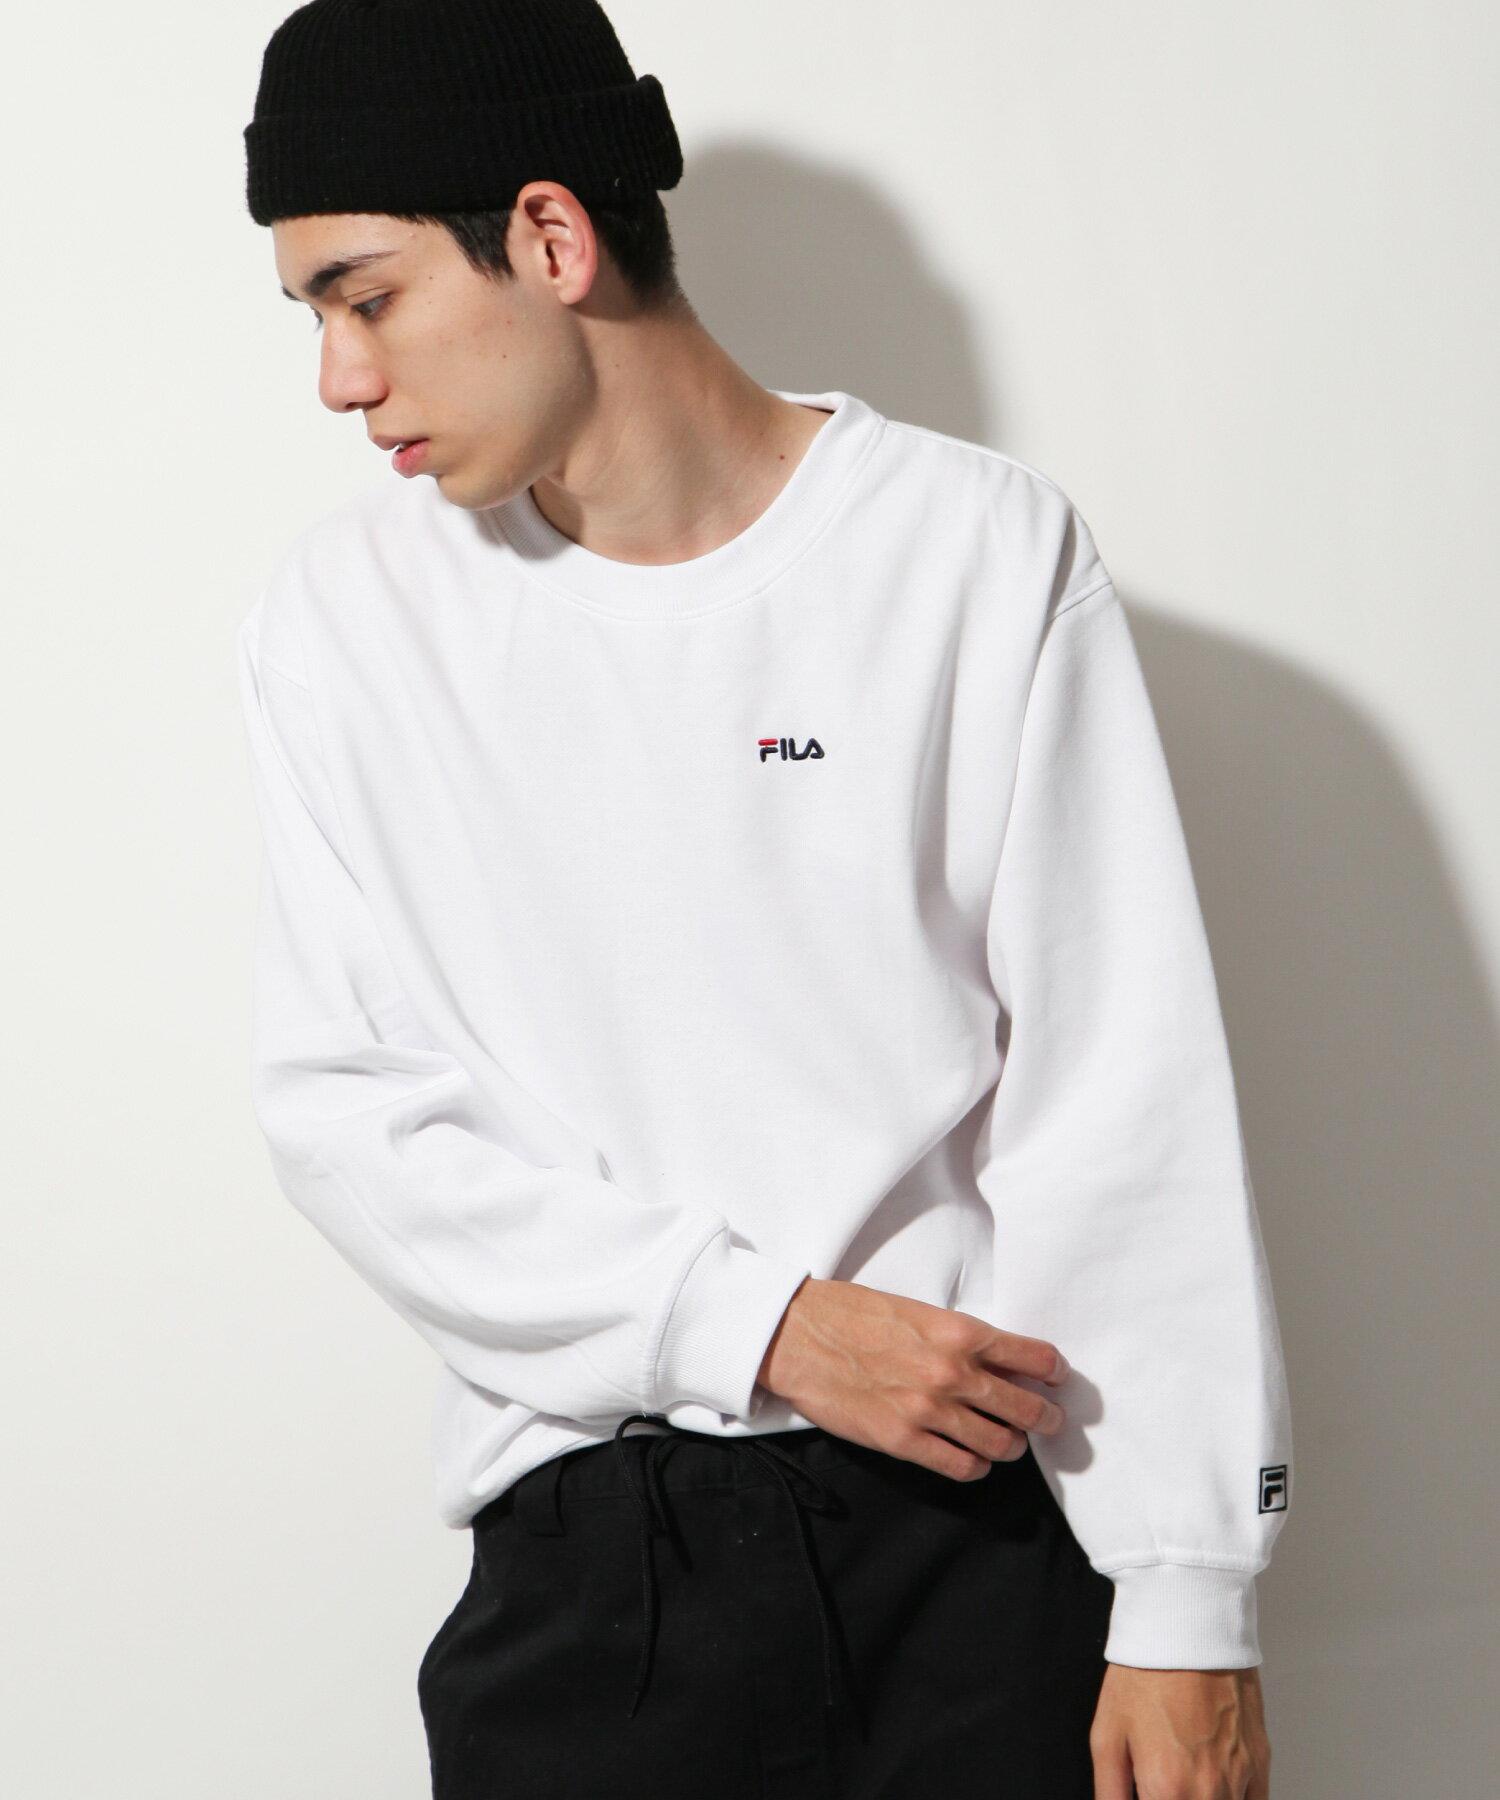 【FILA】LOGO刺繡內刷毛運動衫 1